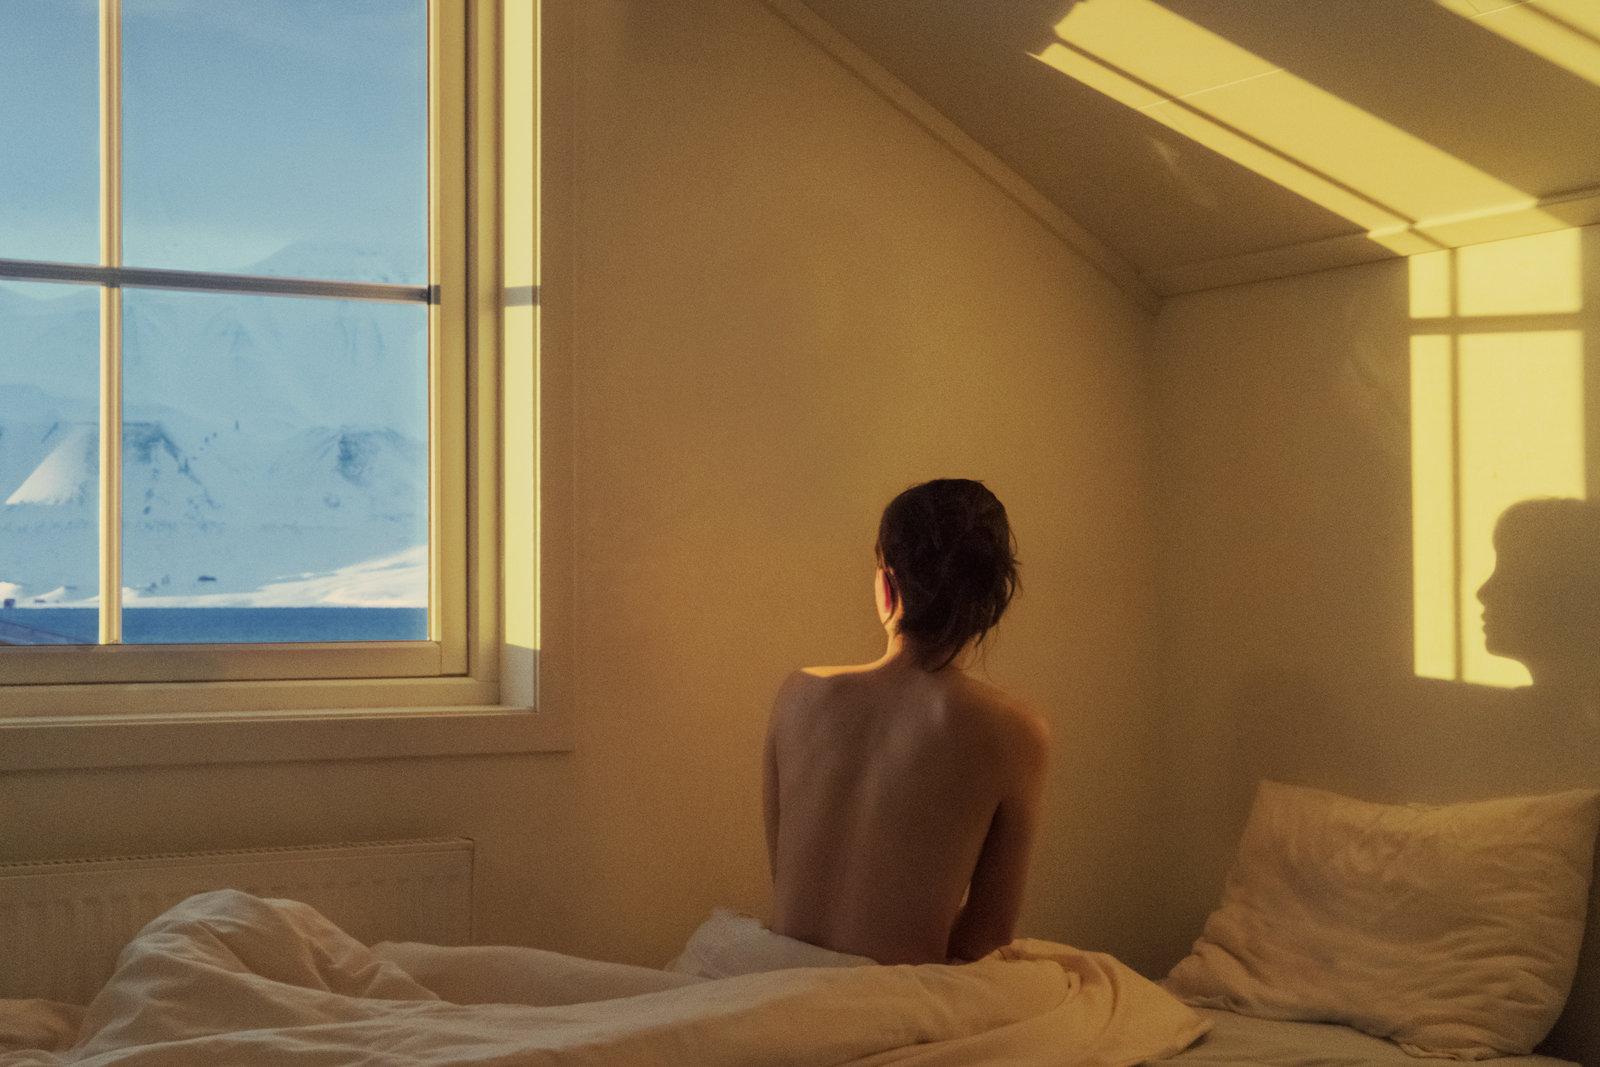 self-portrait in Svalbard